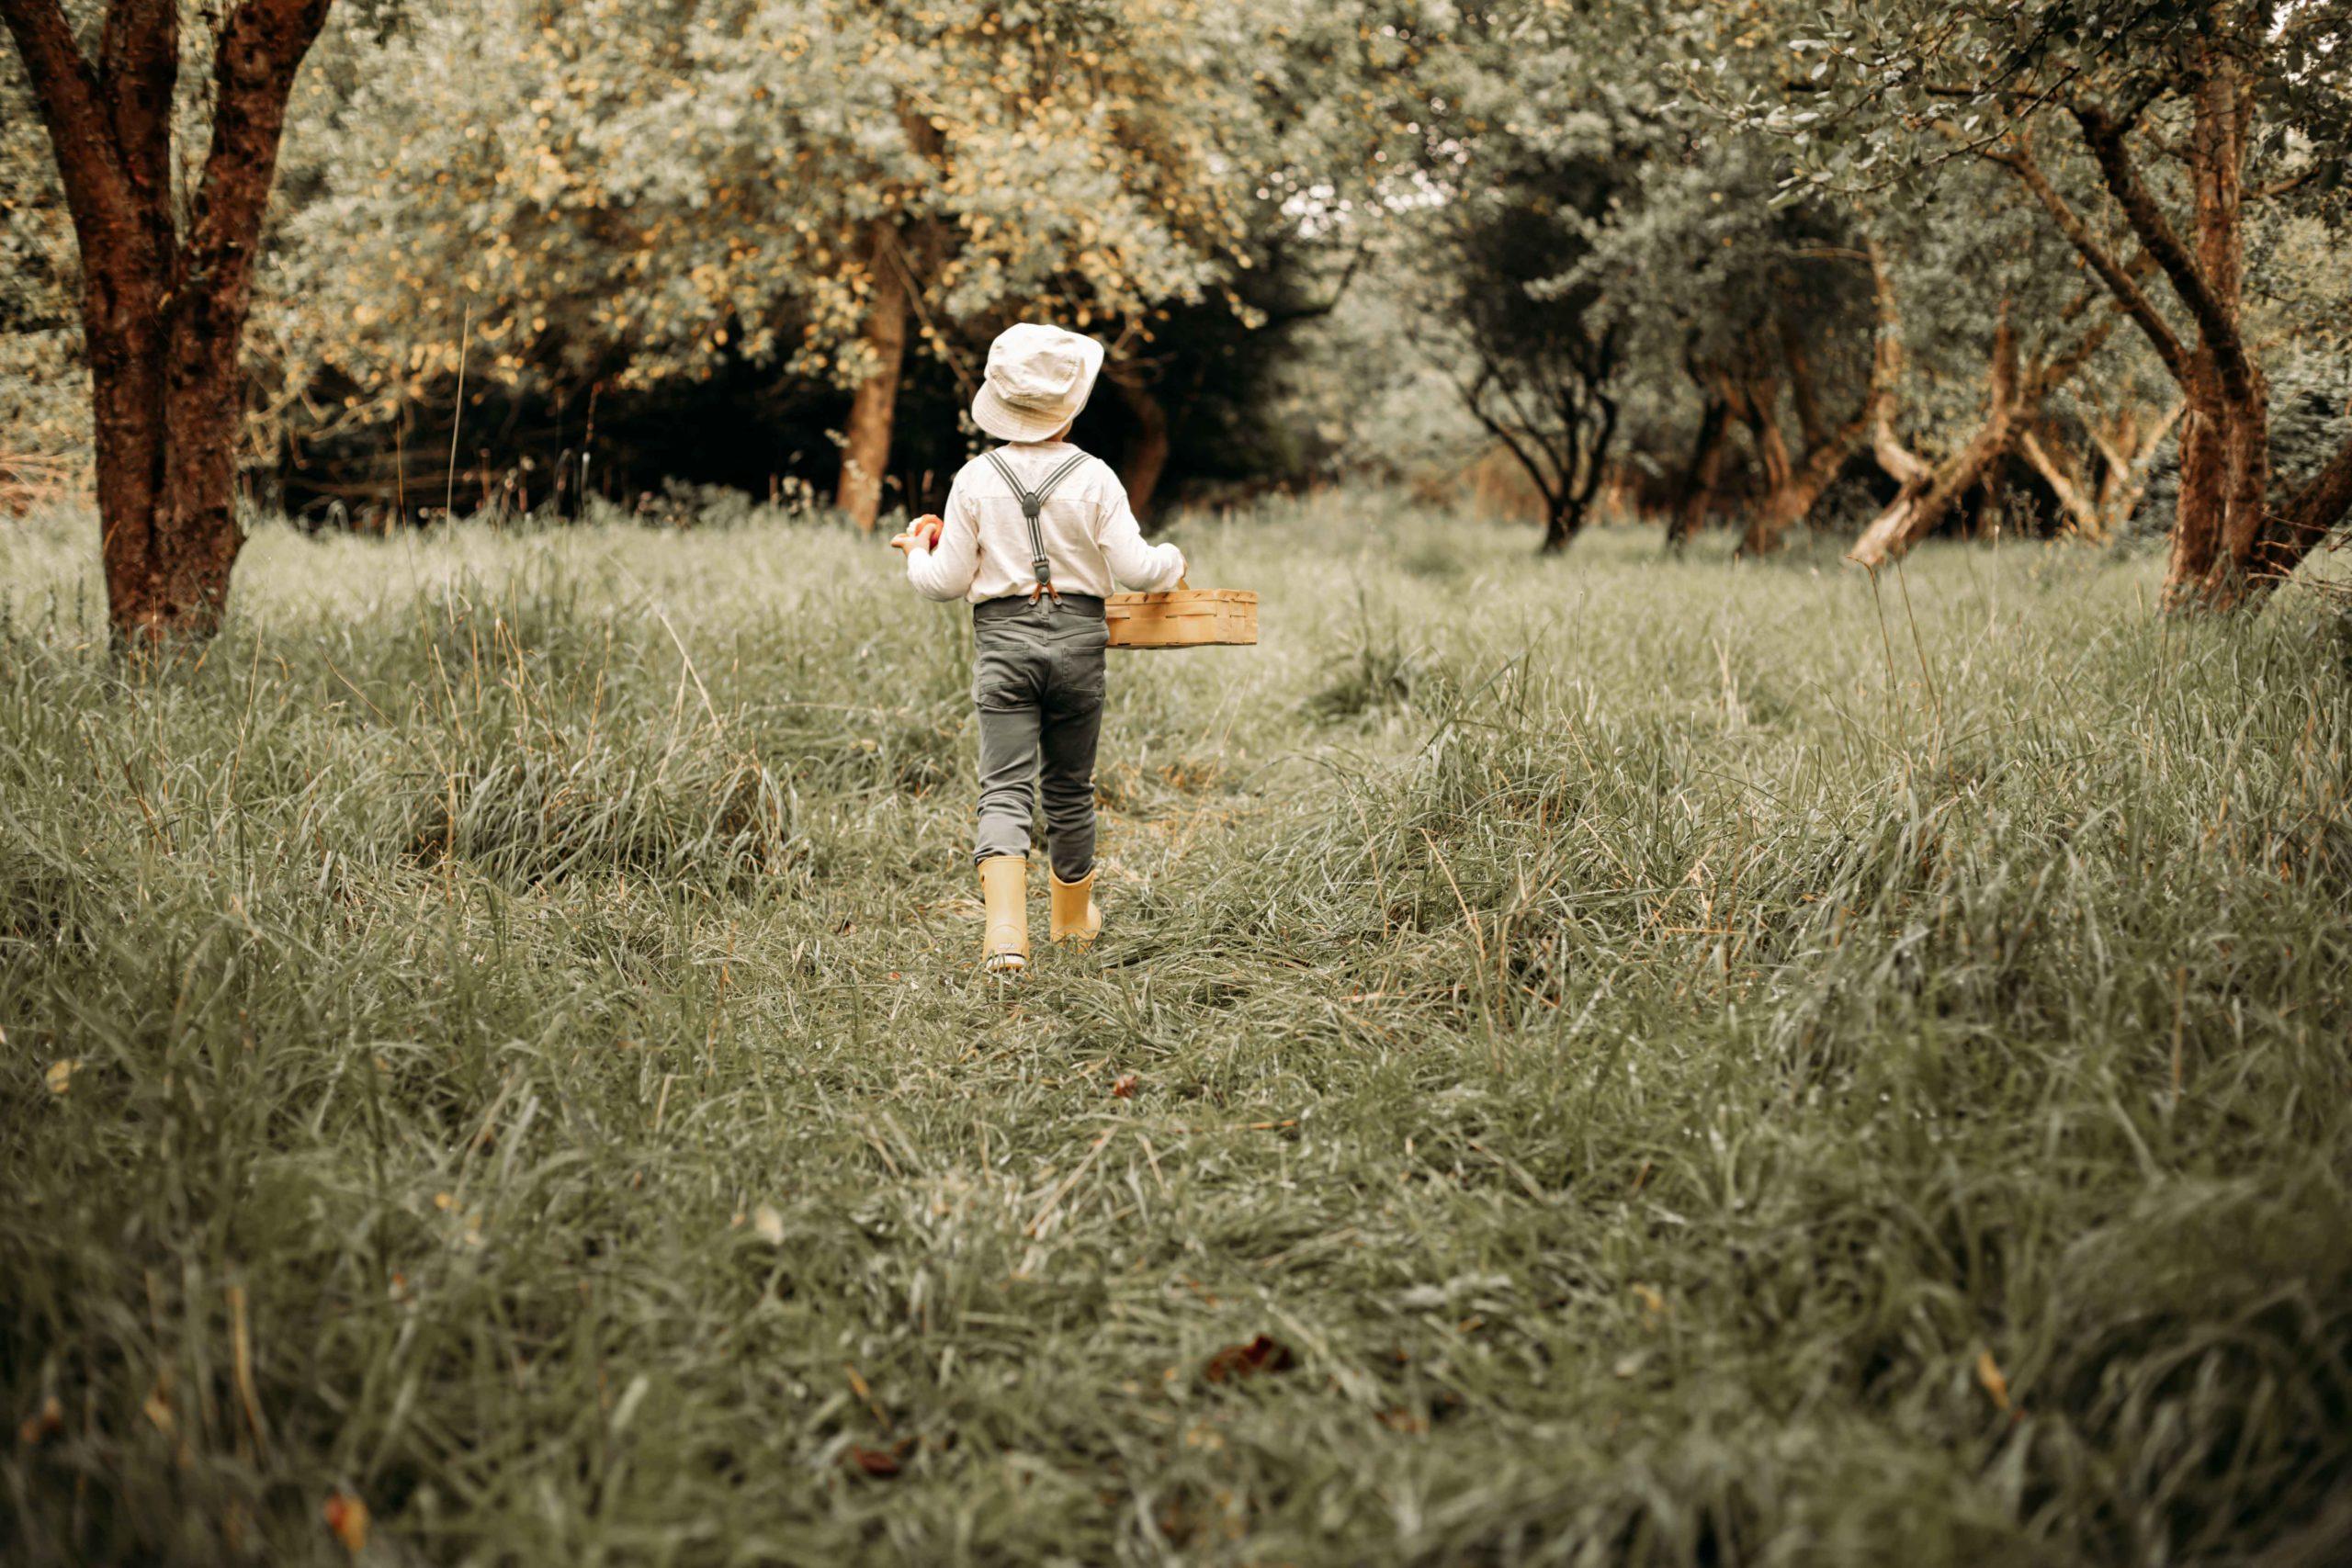 Kindershooting, Portrait, Fotos, Kind, Kleinkind, Outdoorshooting, Obstwiese, Äpfel pflücken, Familienfotograf, Fotograf Emden, Aurich, Leer